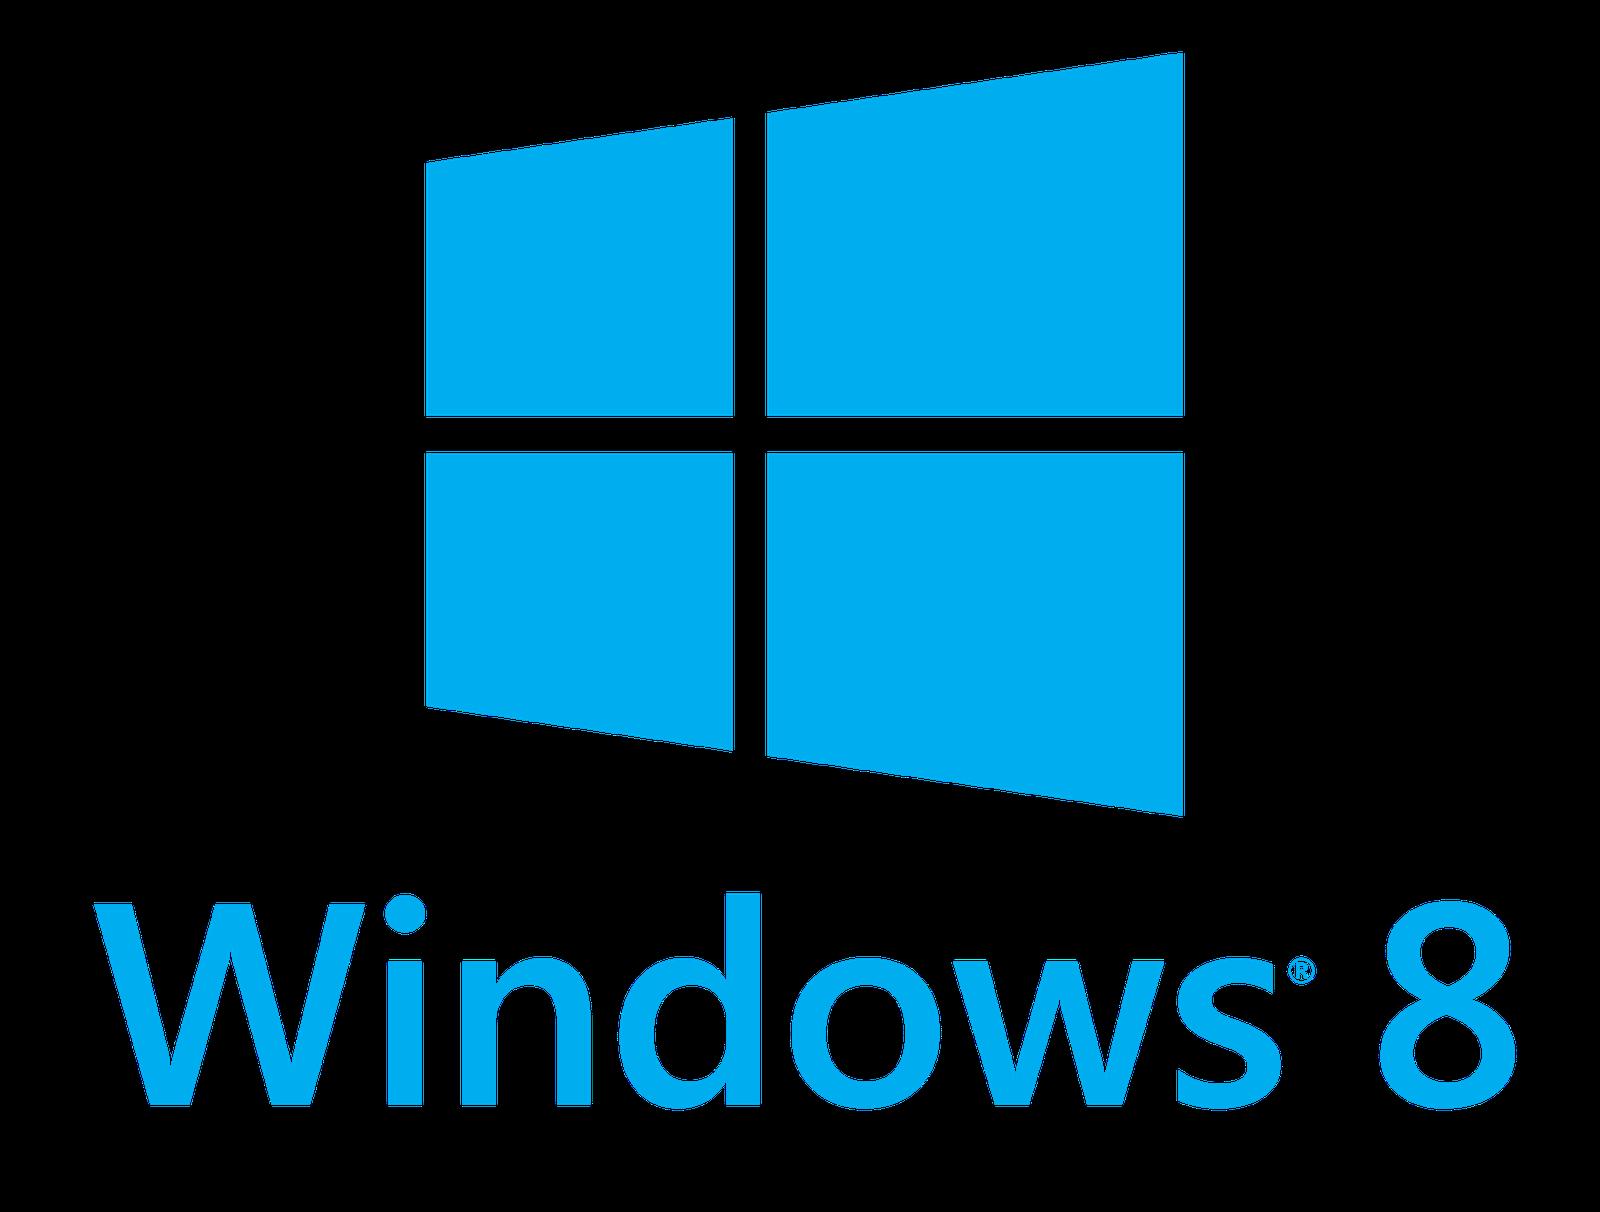 Windows 8 reaches 200 million licenses sold, Windows 8, 200 million licenses sold